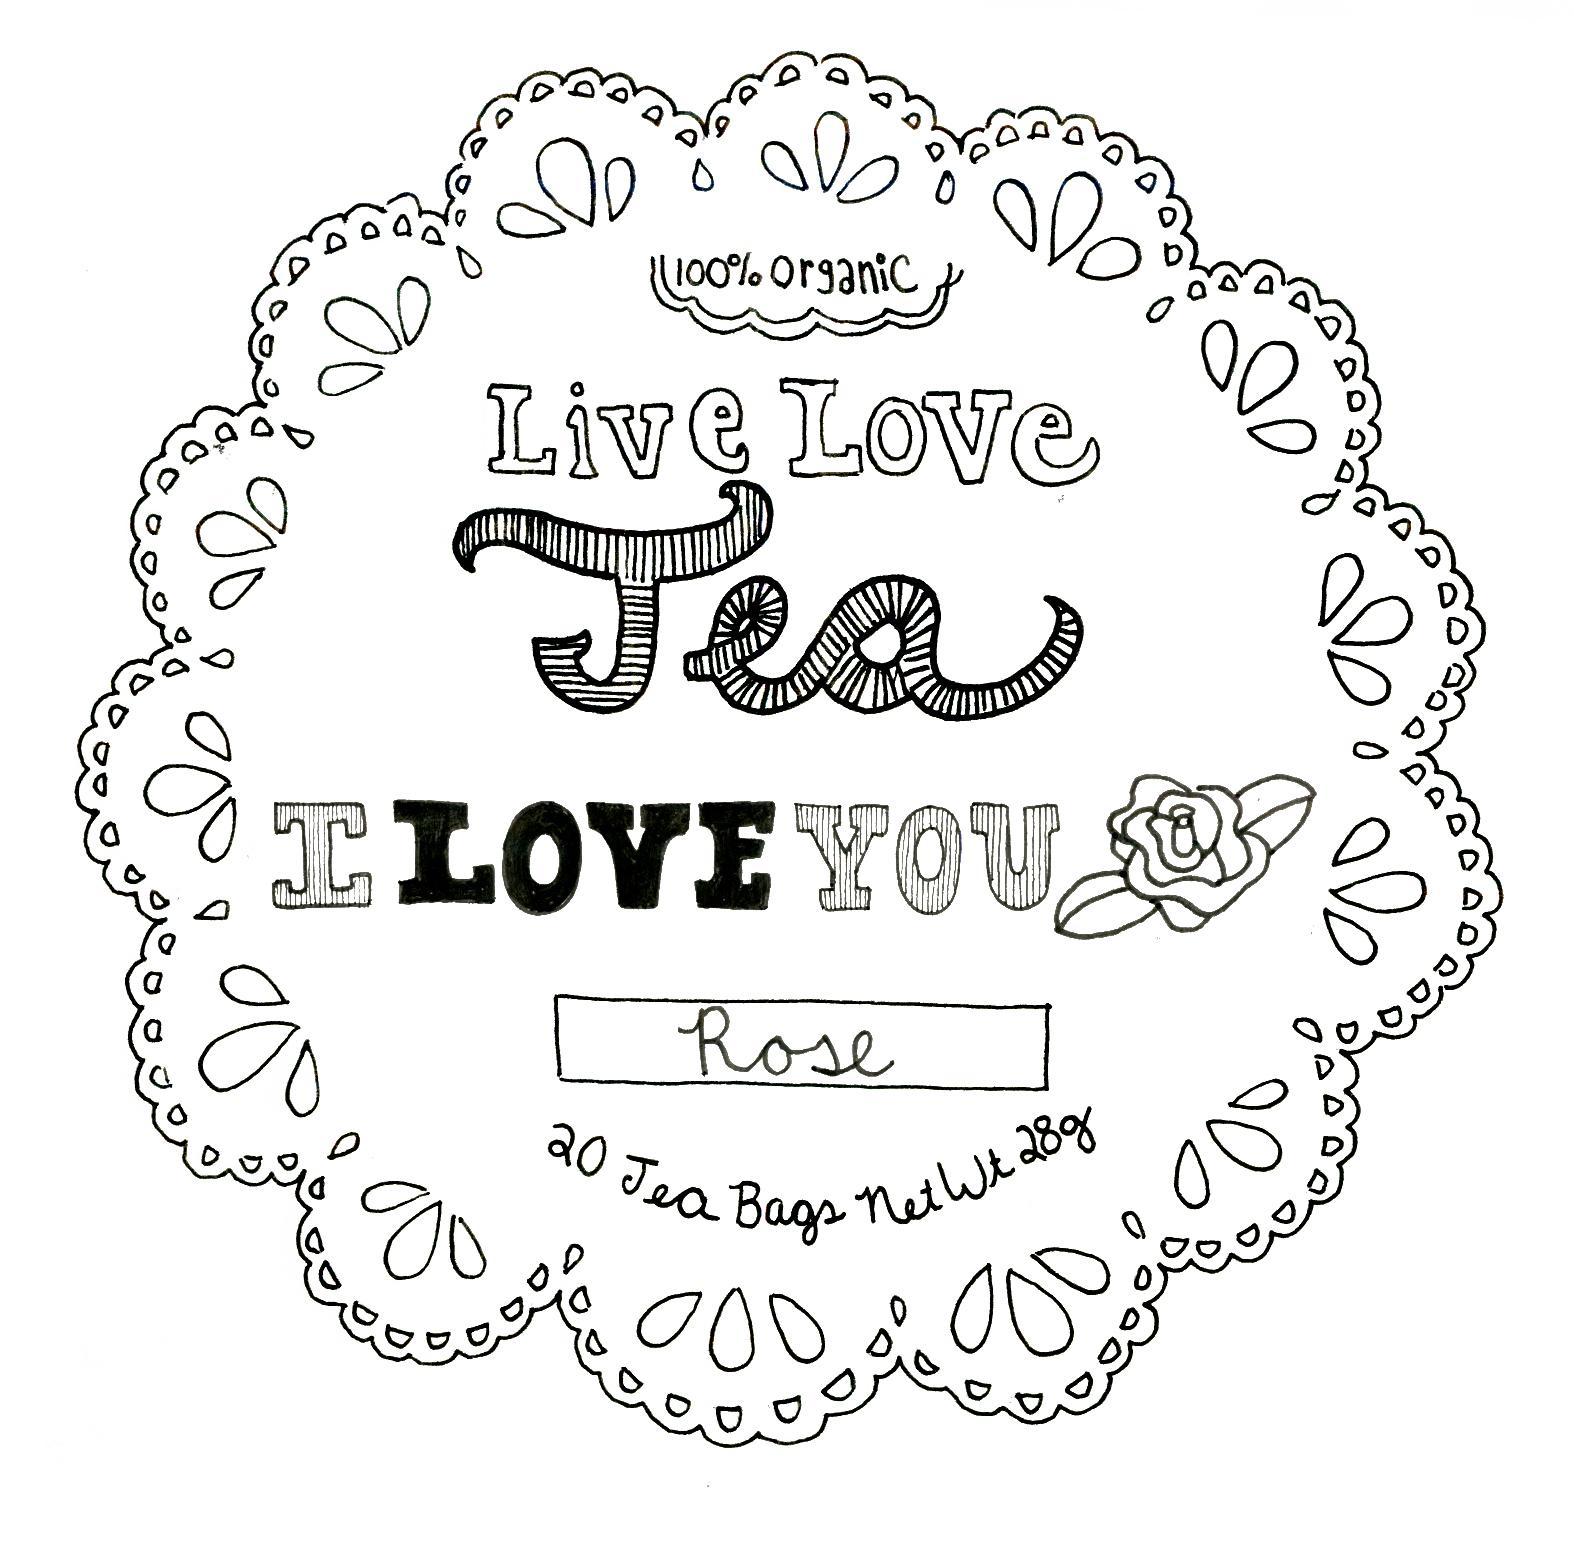 Live.Love.Tea. - image 16 - student project